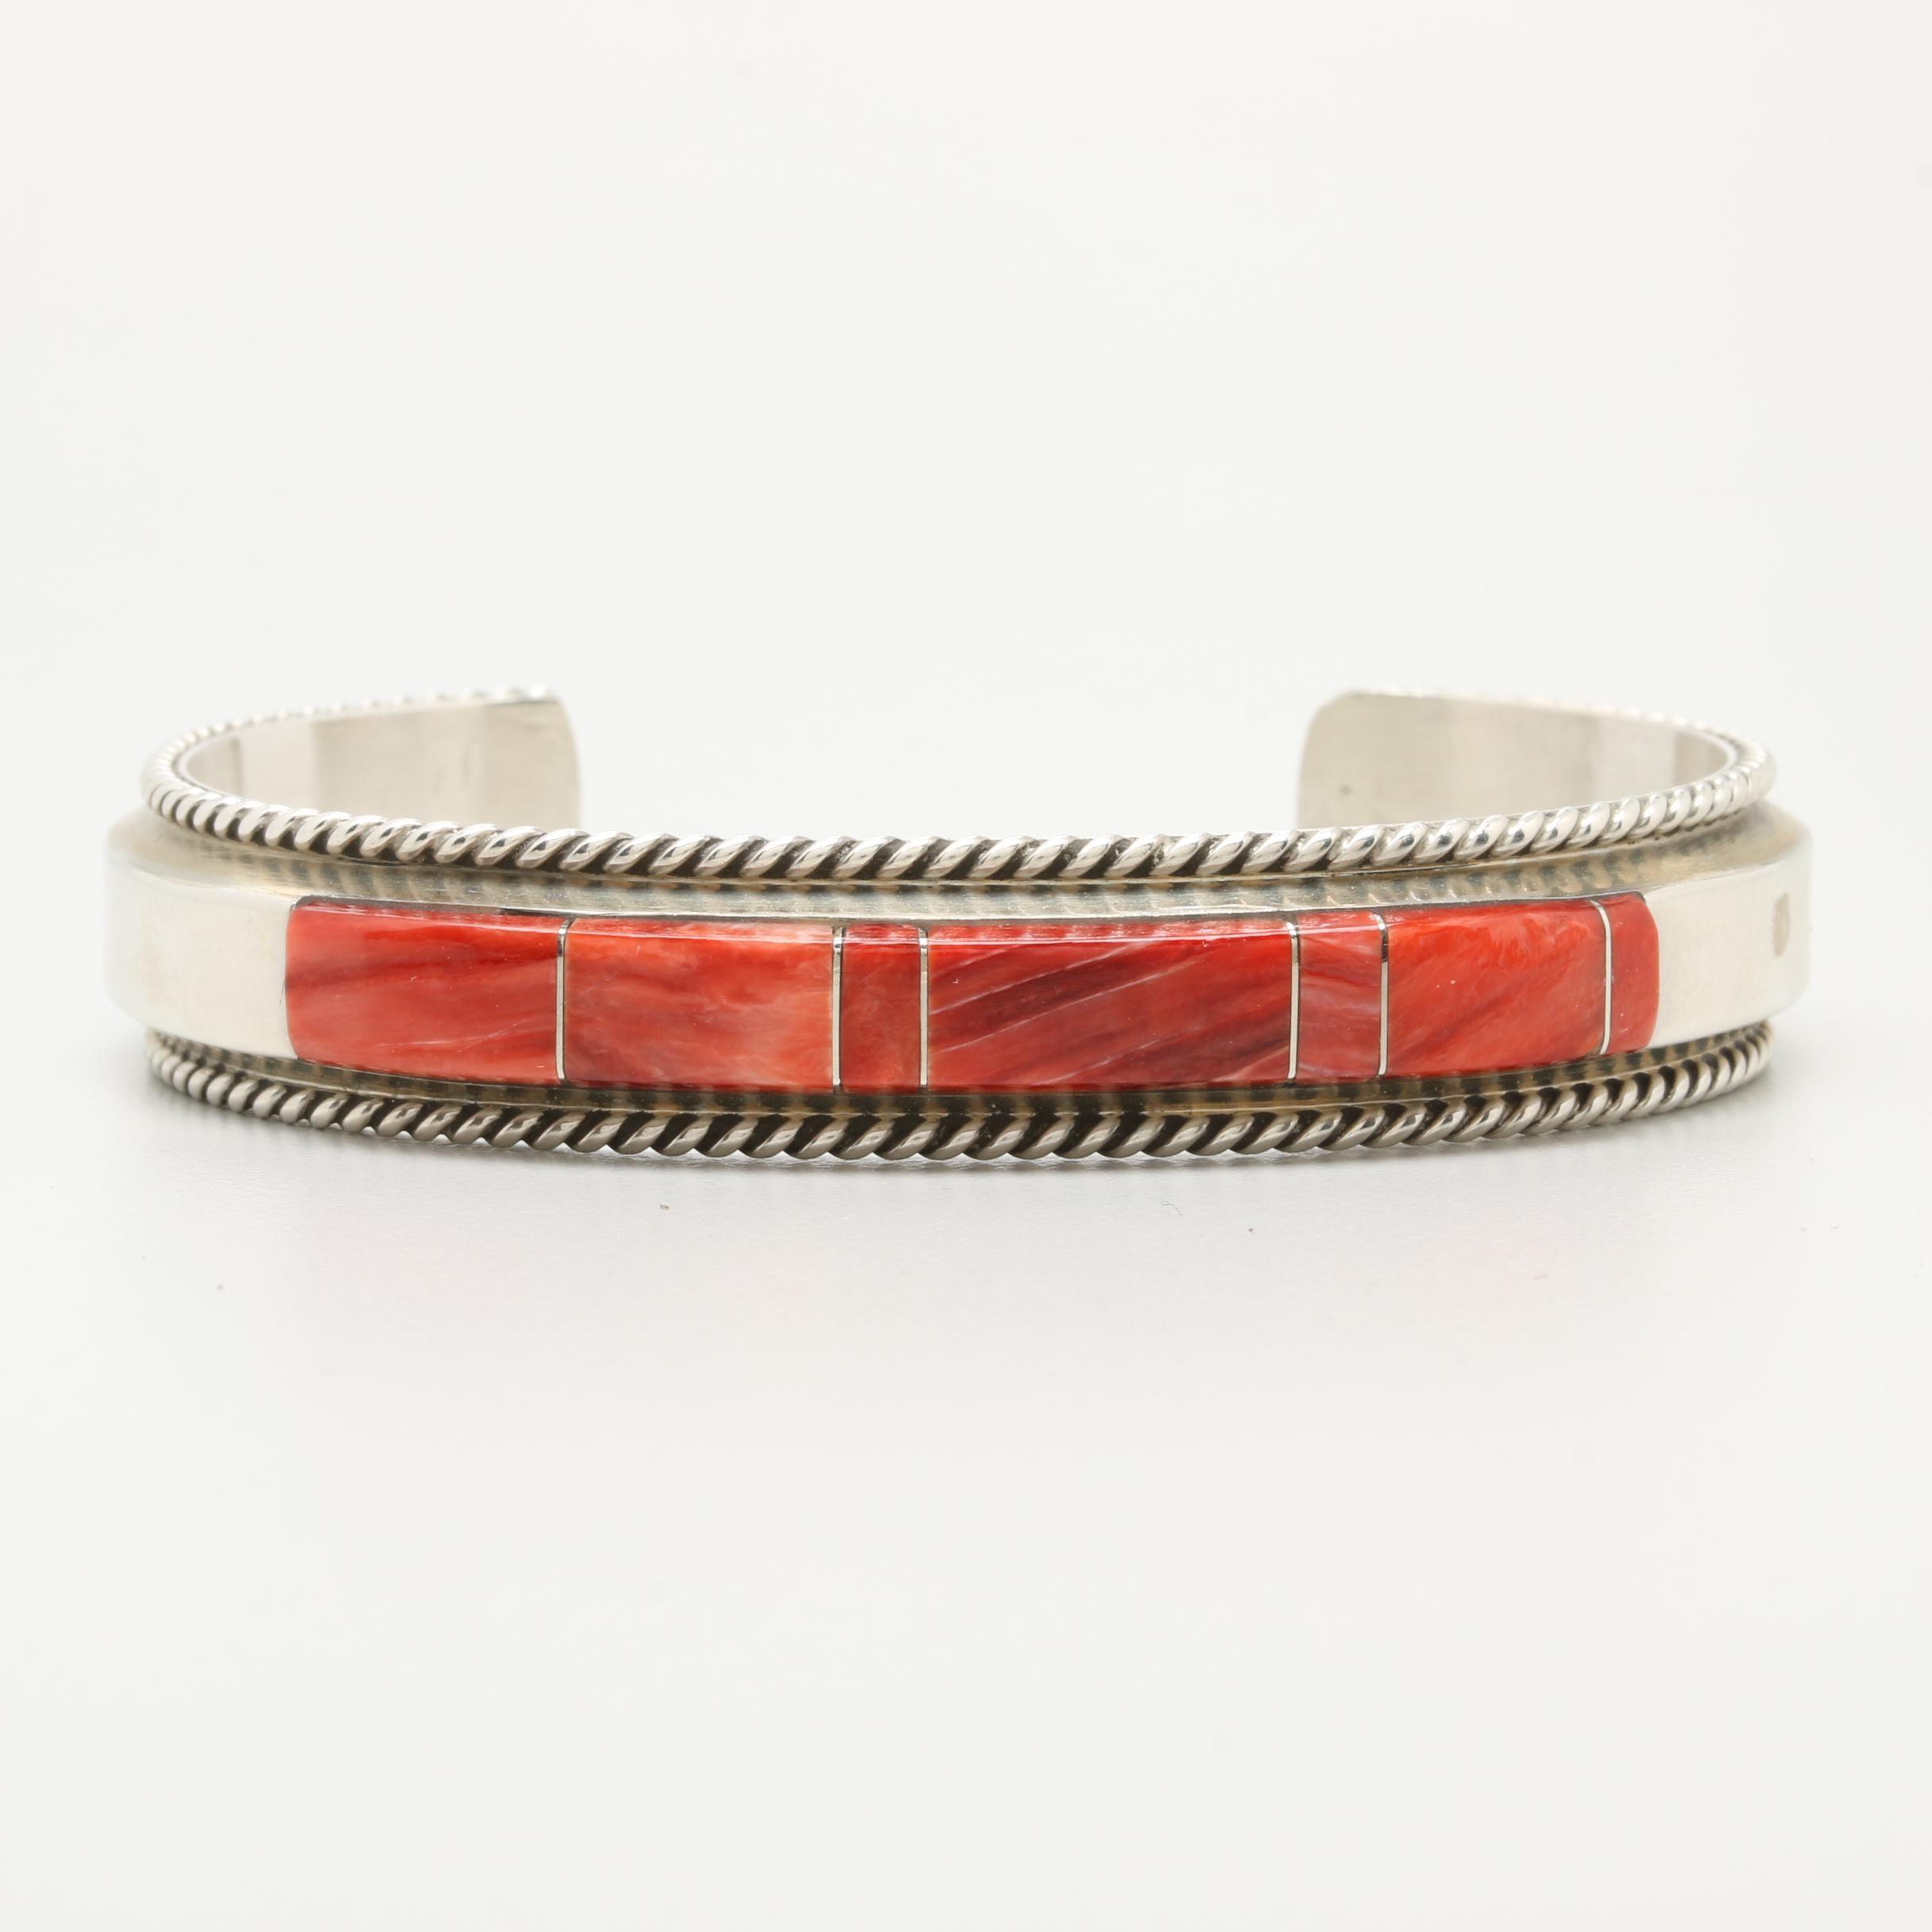 Fannie Platero Navajo Diné Sterling Silver Spiny Oyster Cuff Bracelet